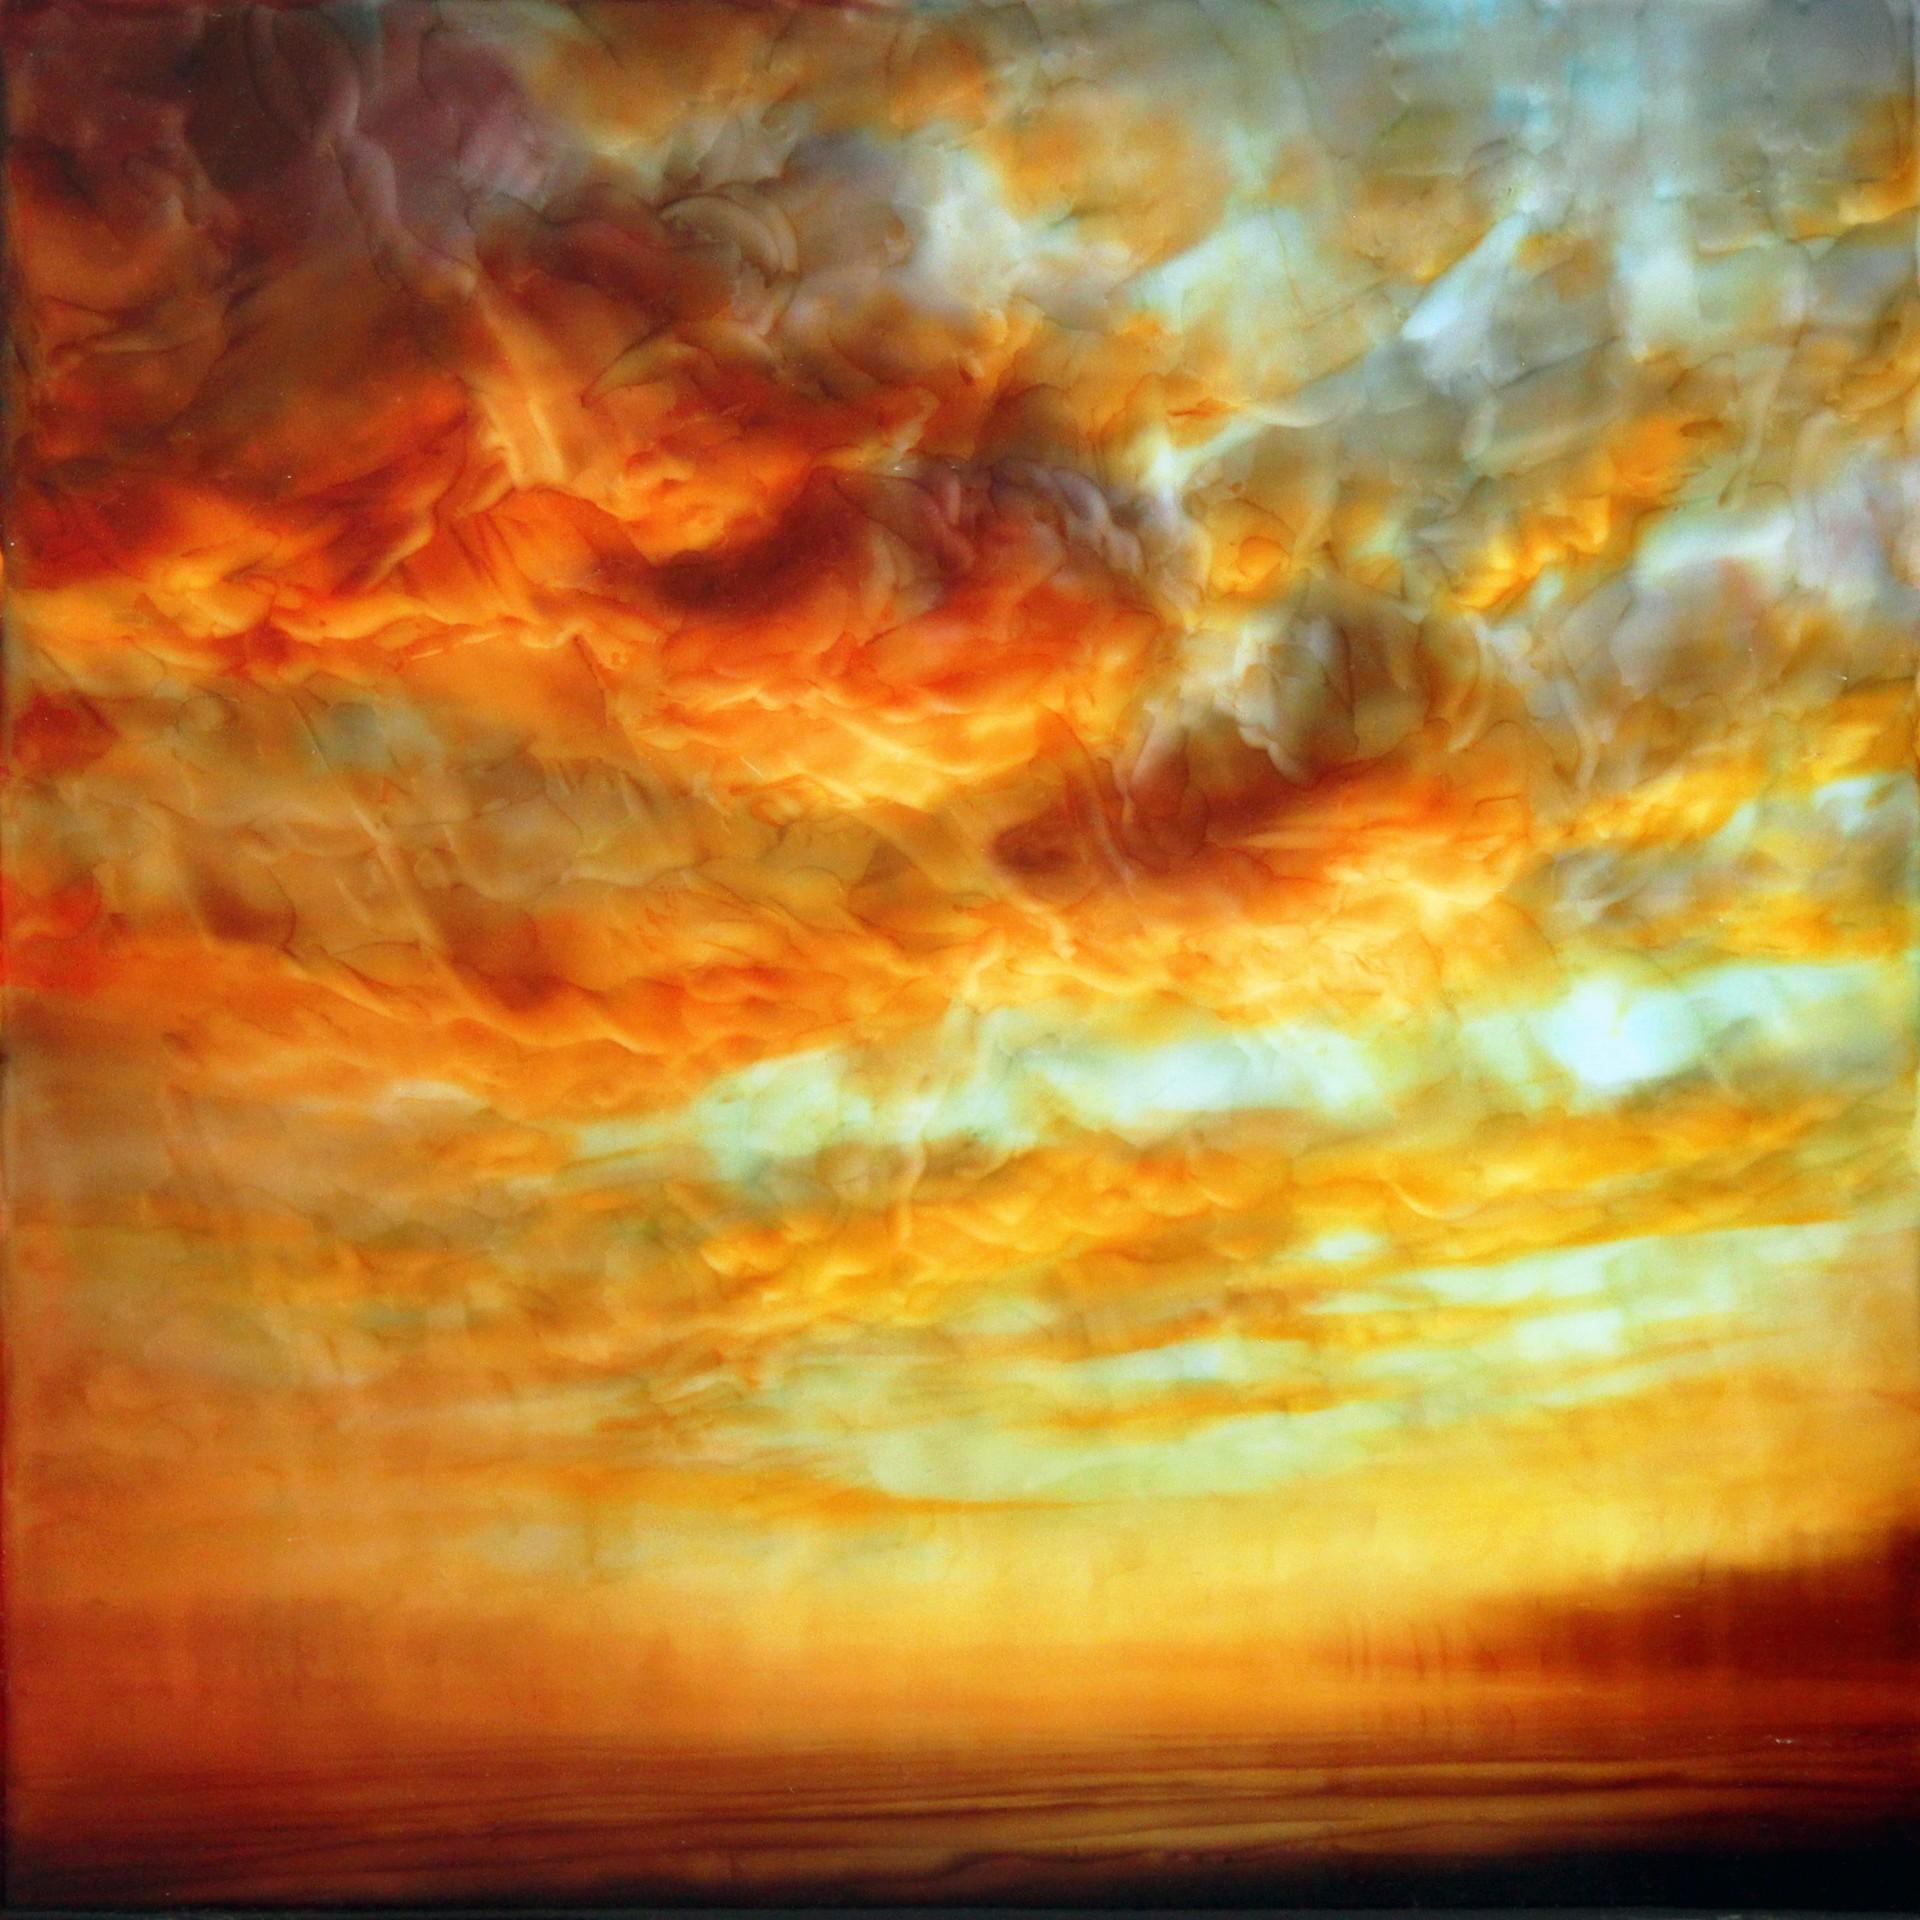 Fire Sky by Brian Sostrom